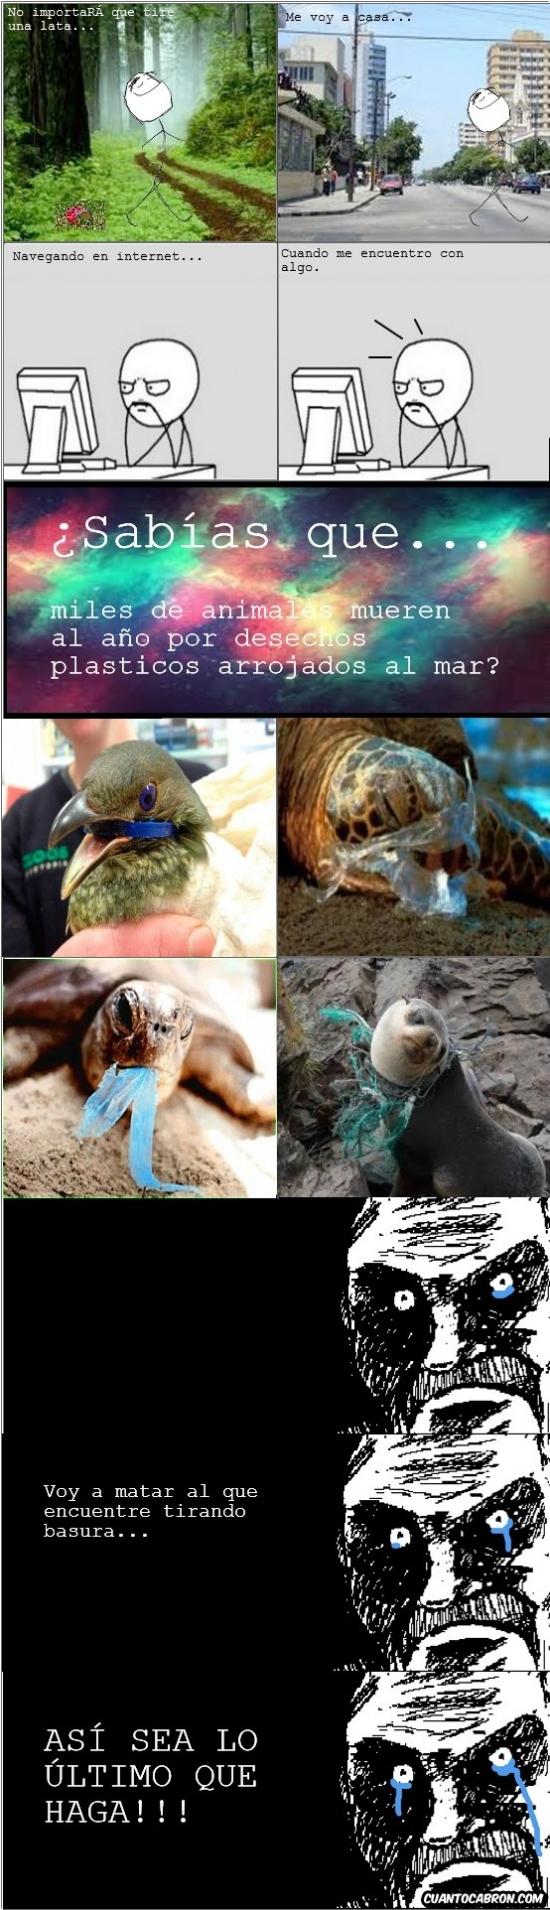 animales,Basura,lagrimas,muerte,no tirar,plastico,sabias que